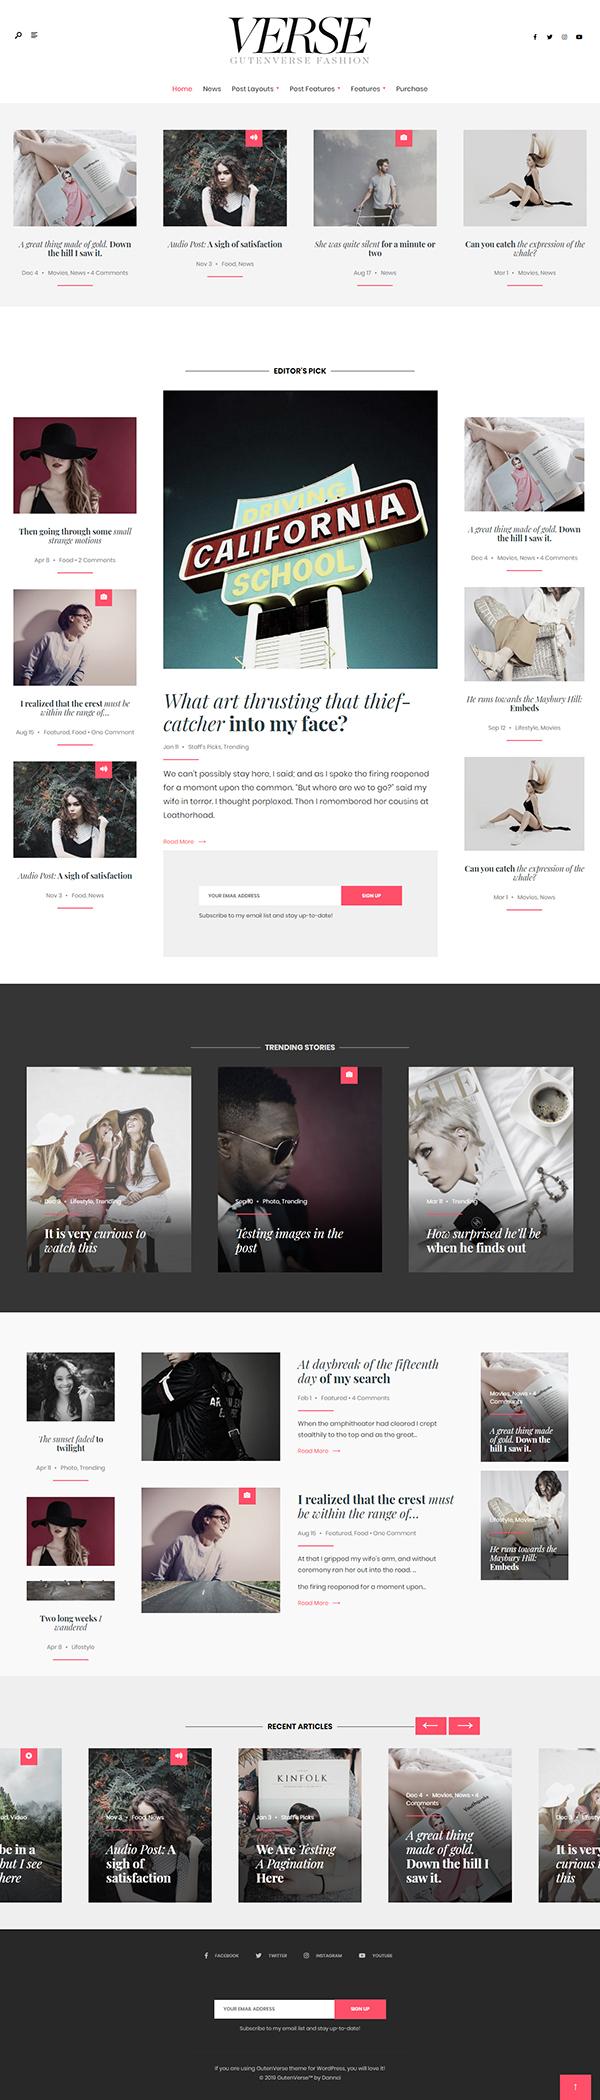 GutenVerse - Magazine and Blog Theme